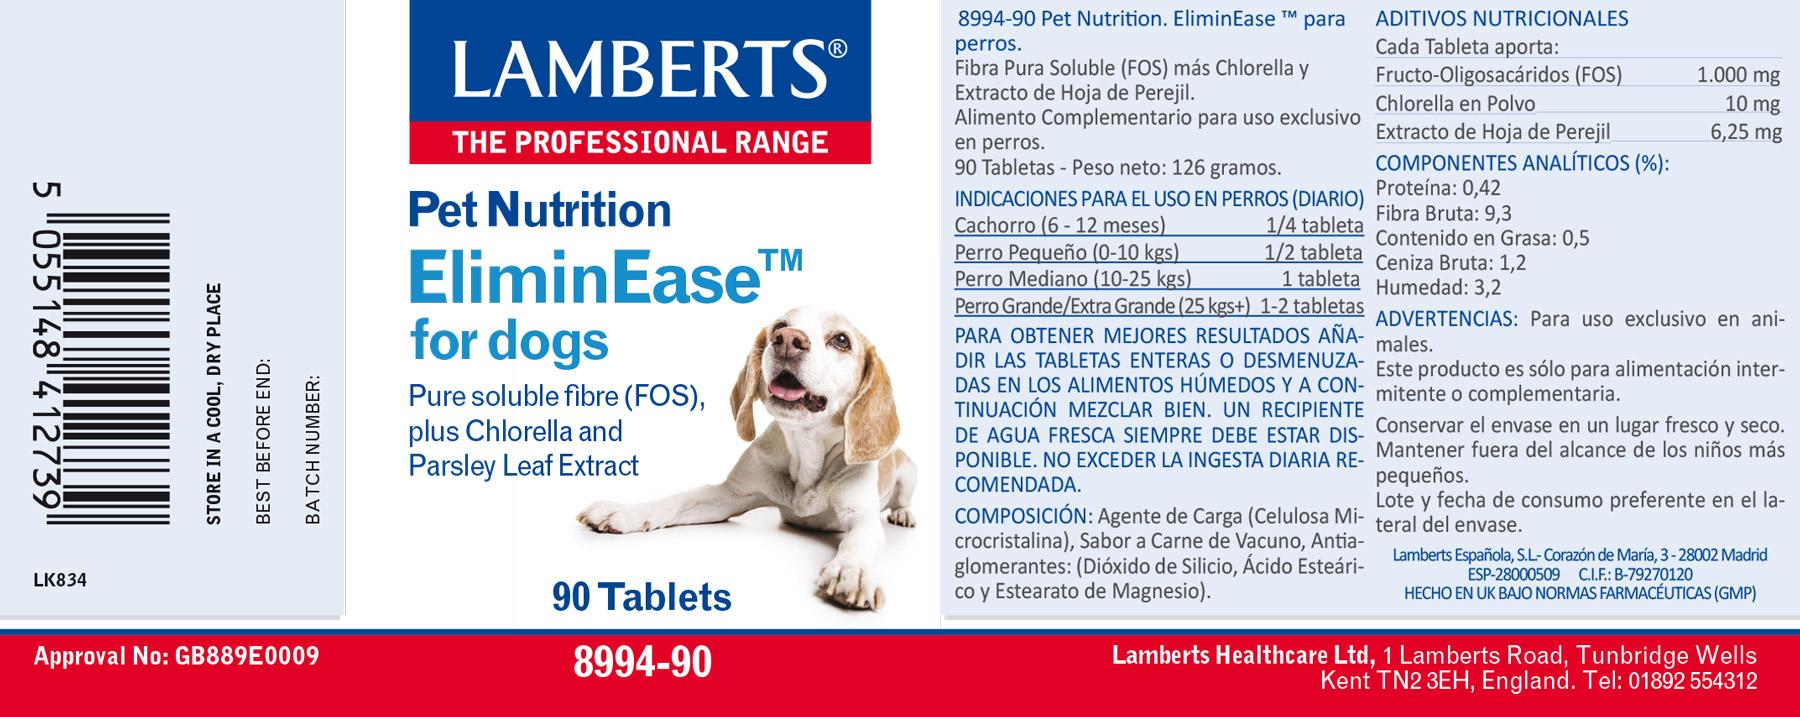 EliminEase para perros